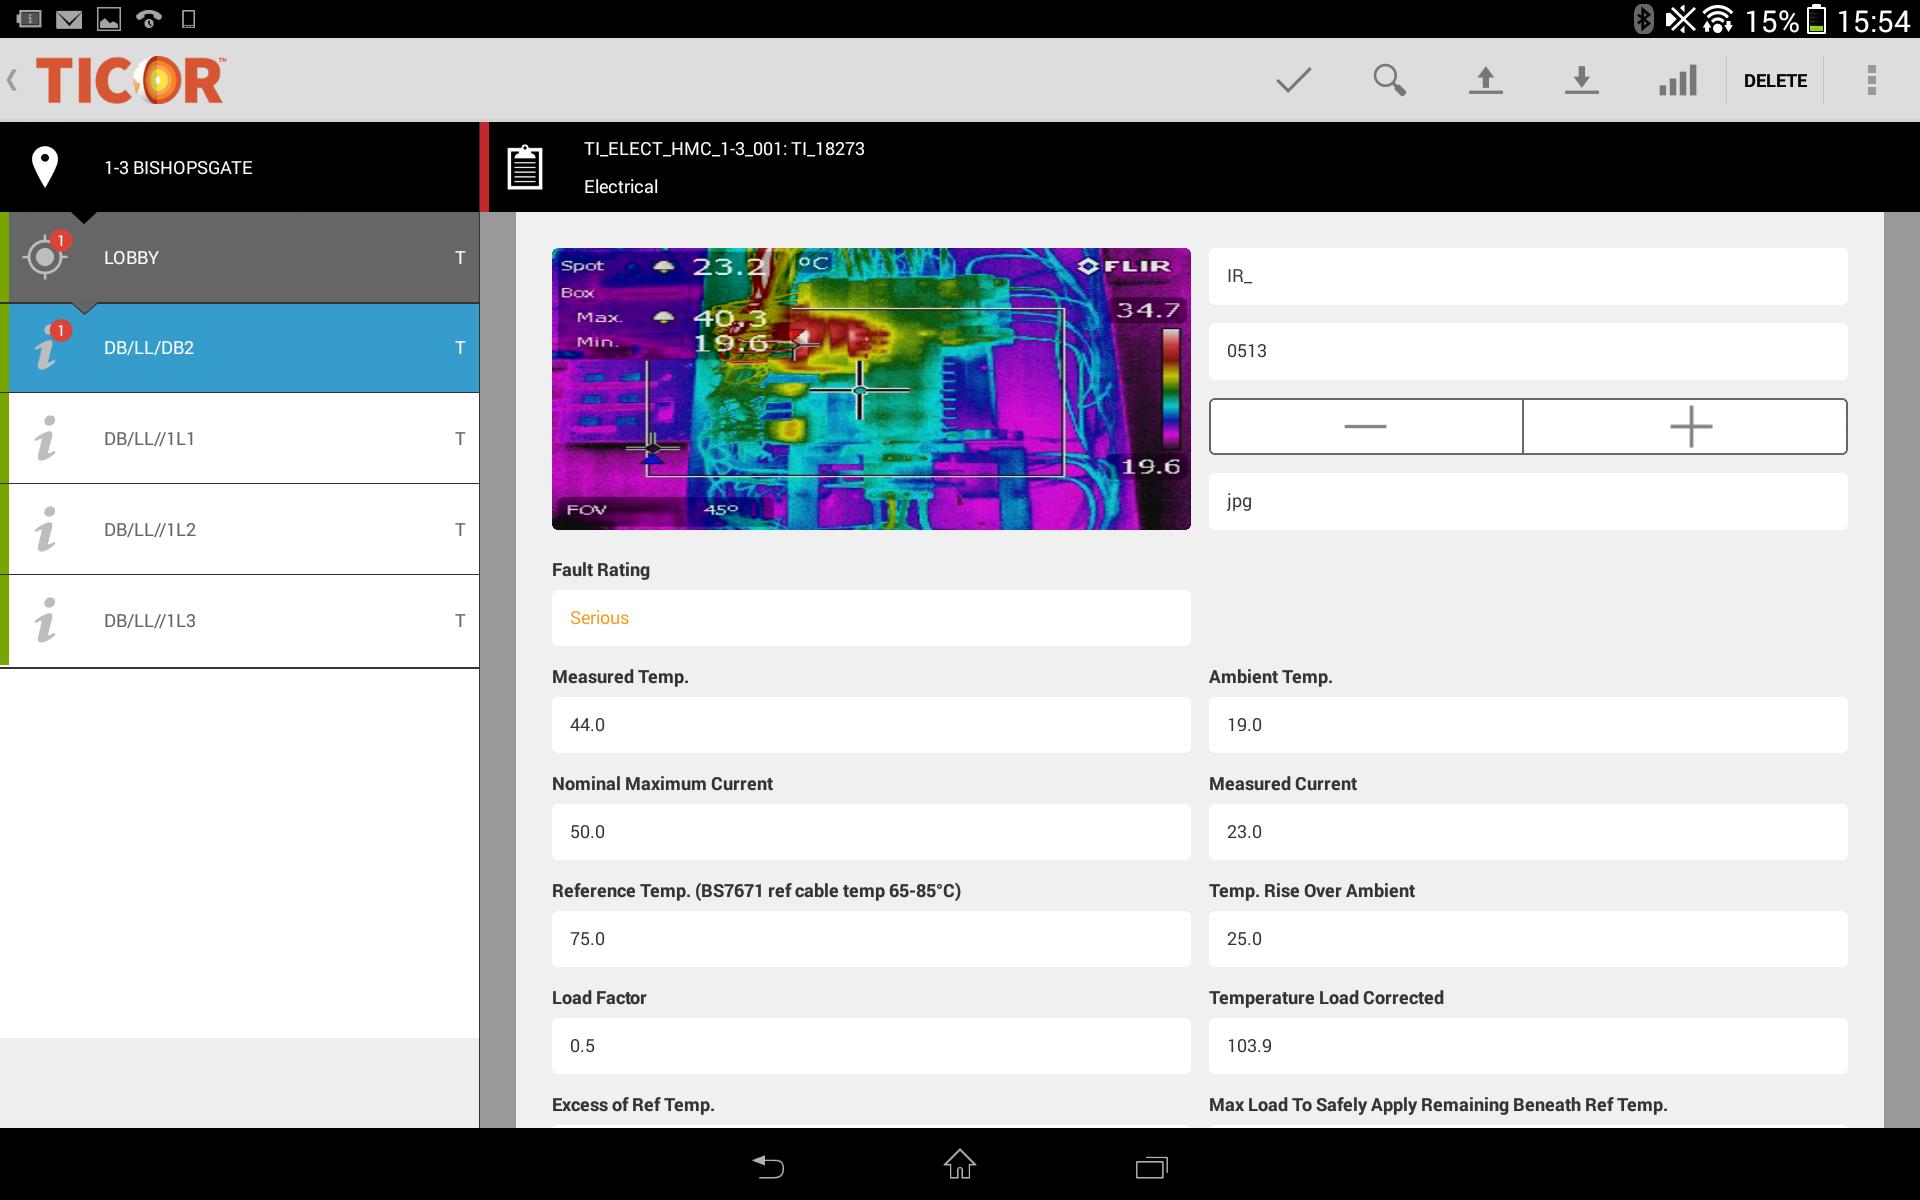 Thermal Imaging Software - Ticor In Thermal Imaging Report Template